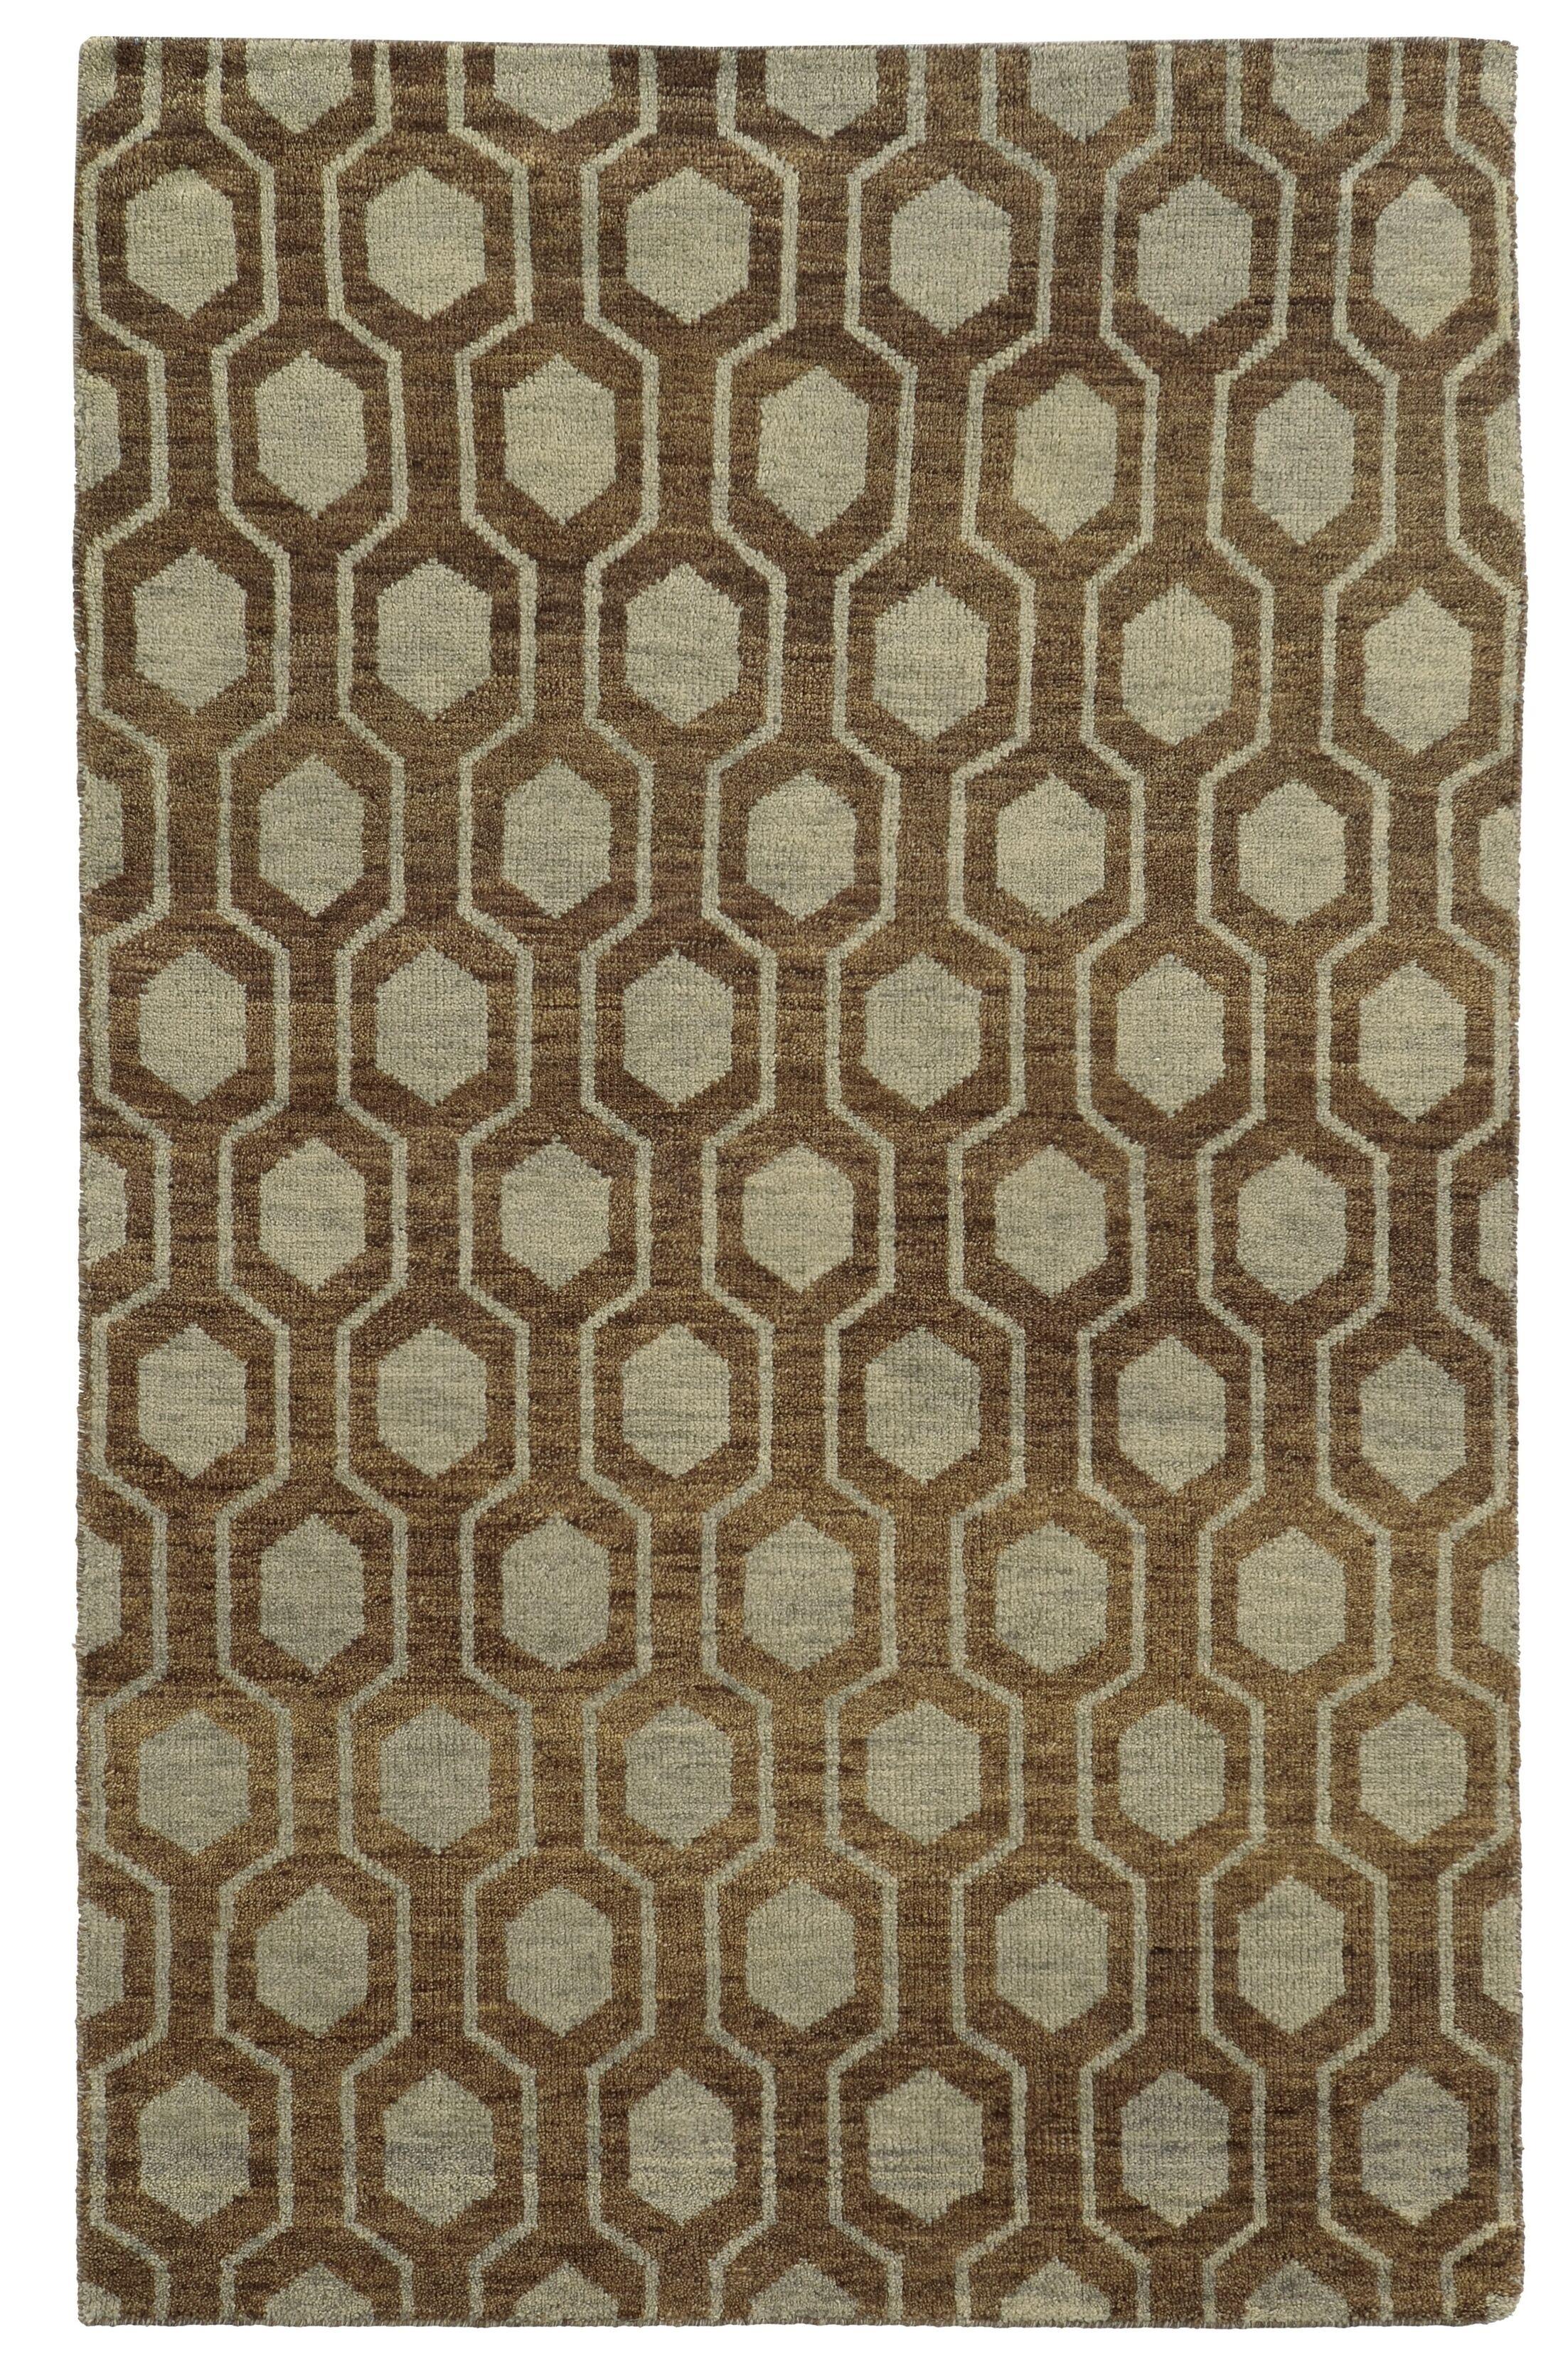 Tommy Bahama Maddox Brown / Blue Geometric Rug Rug Size: Rectangle 10' x 13'